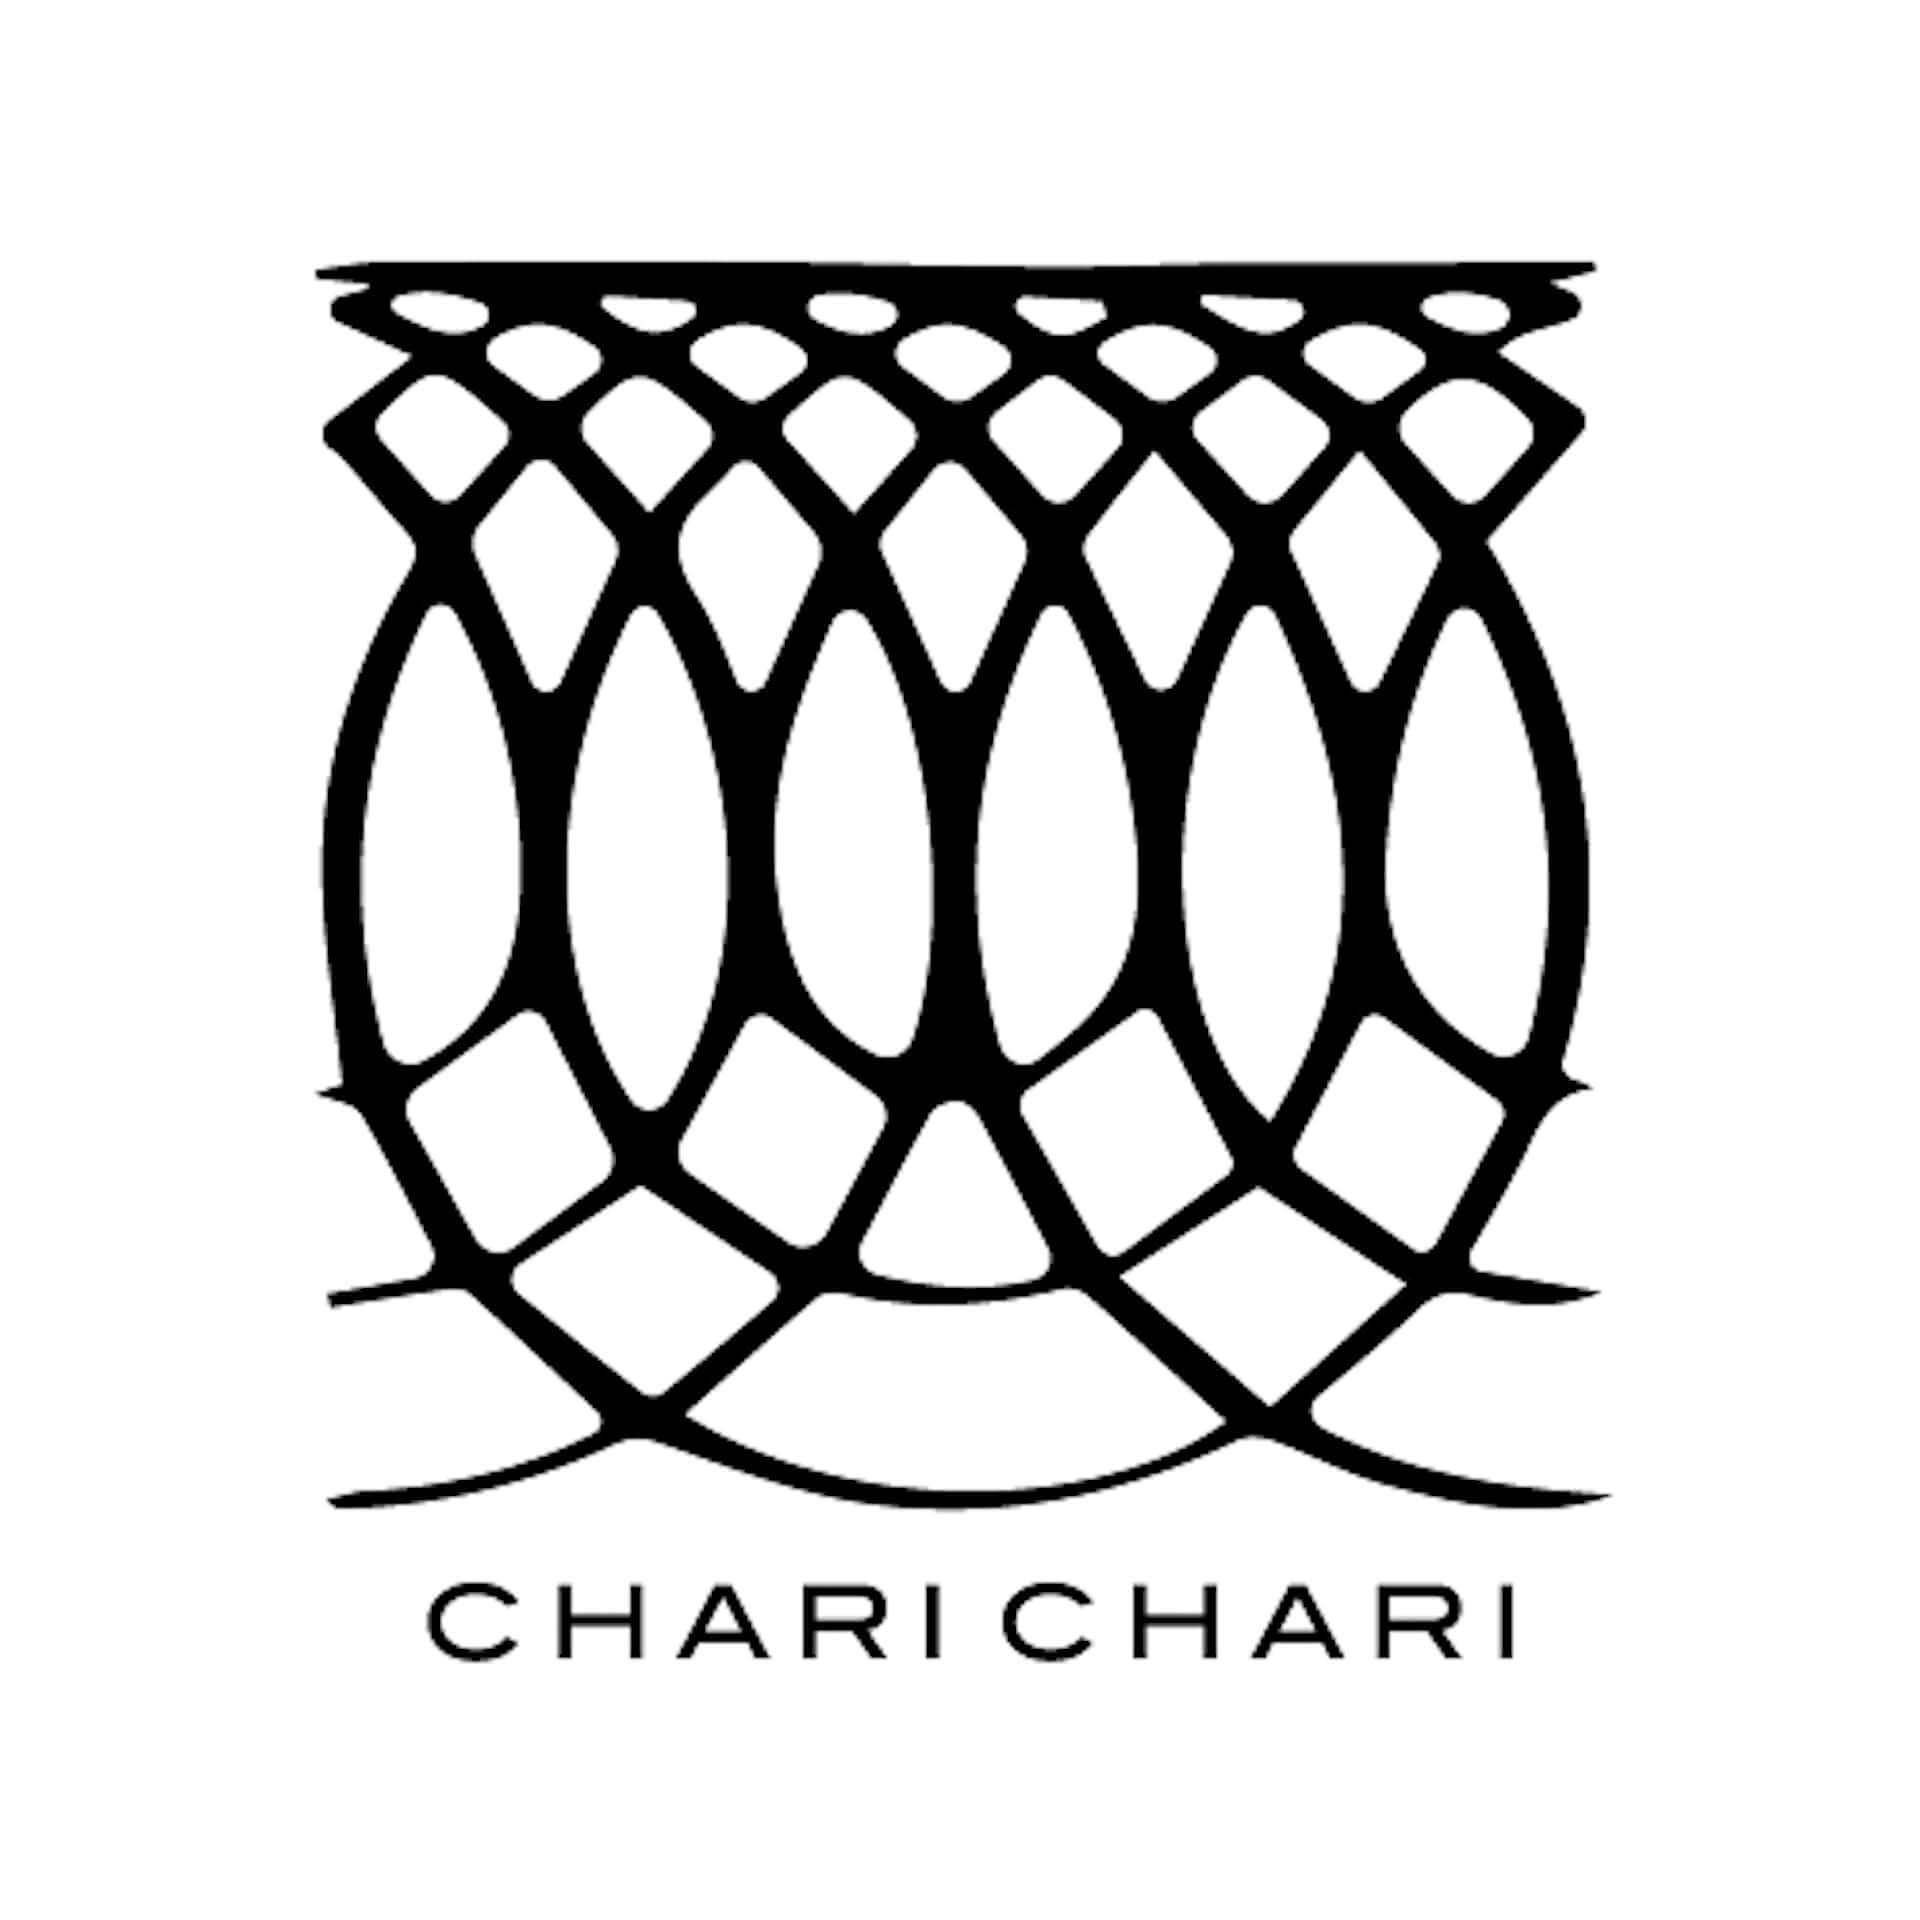 Kaoru Inoue、Chari Chari名義で18年振りのニューアルバム『We hear the last decades dreaming』を発表!自身主宰のレーベル〈Seeds And Ground〉よりデジタル配信もスタート music200618_kaoruinoue_-1920x1920